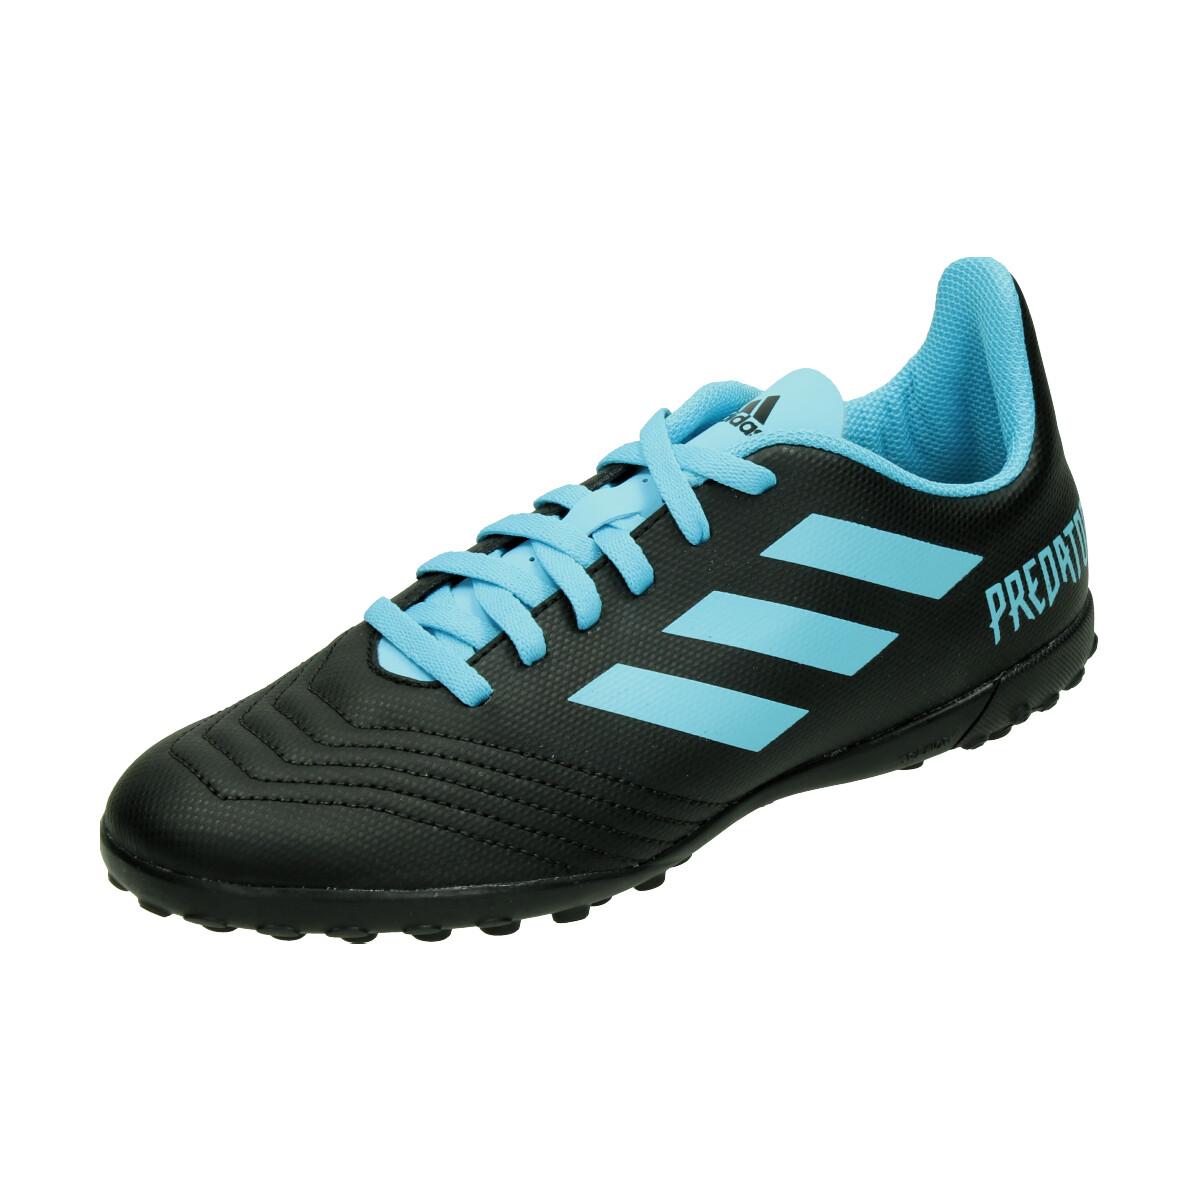 progresivo Pompeya extraterrestre  Adidas PREDATOR 19.4 TF J van turf voetbalschoenen